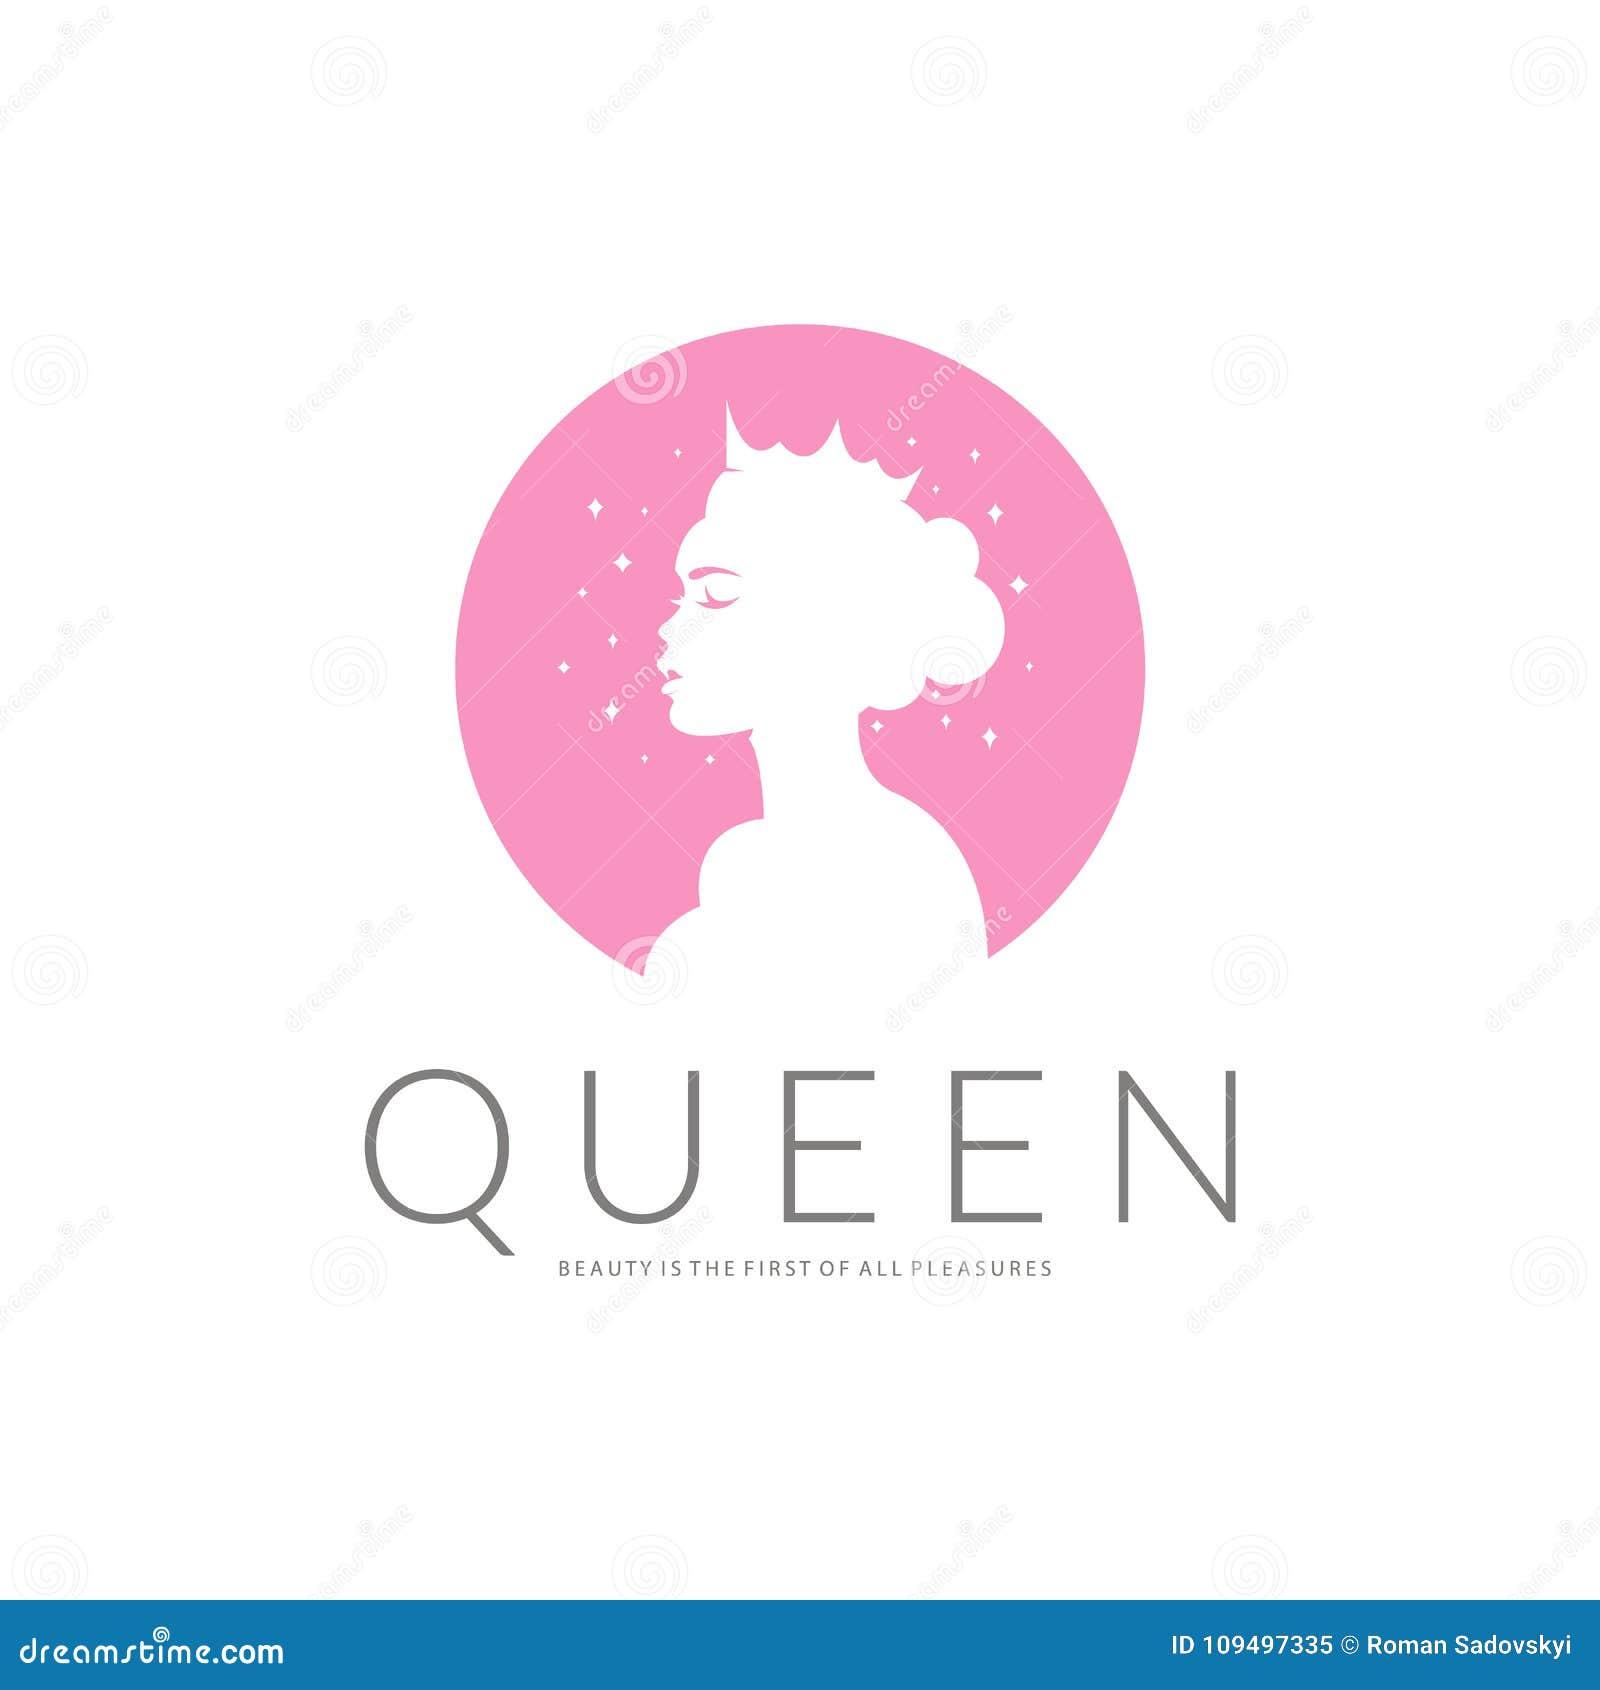 Queen Logo Beauty Logo Vector Logo Design For Beauty Salon Hair Salon Cosmetic Stock Vector Illustration Of Cosmetic Family 109497335